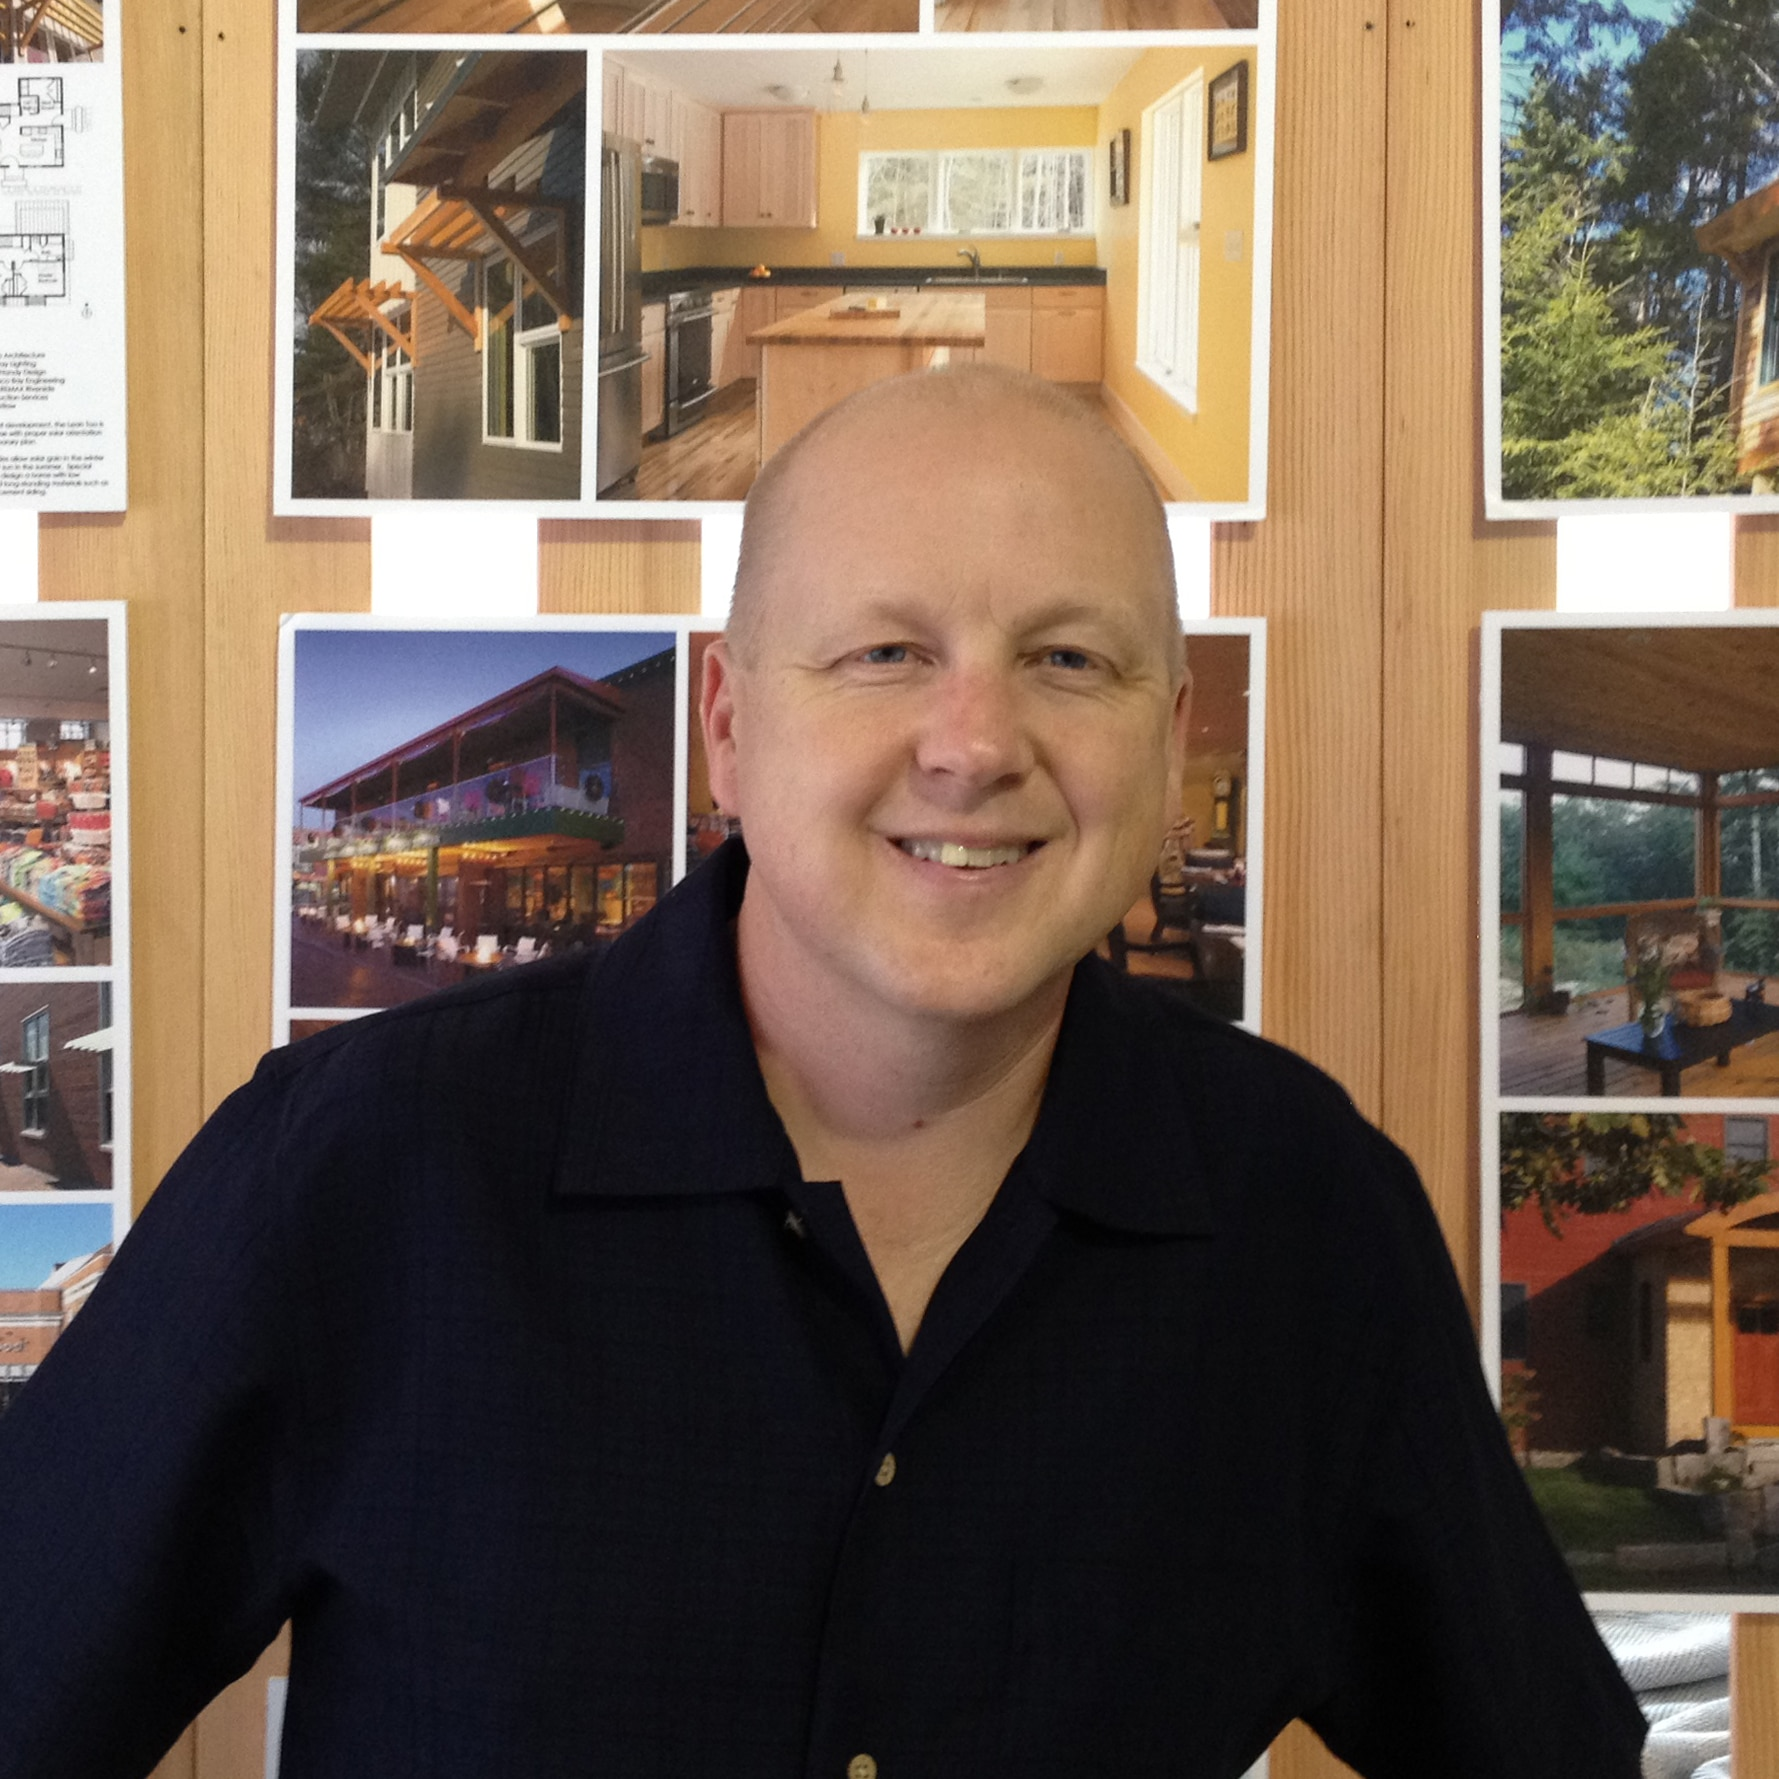 David Matero